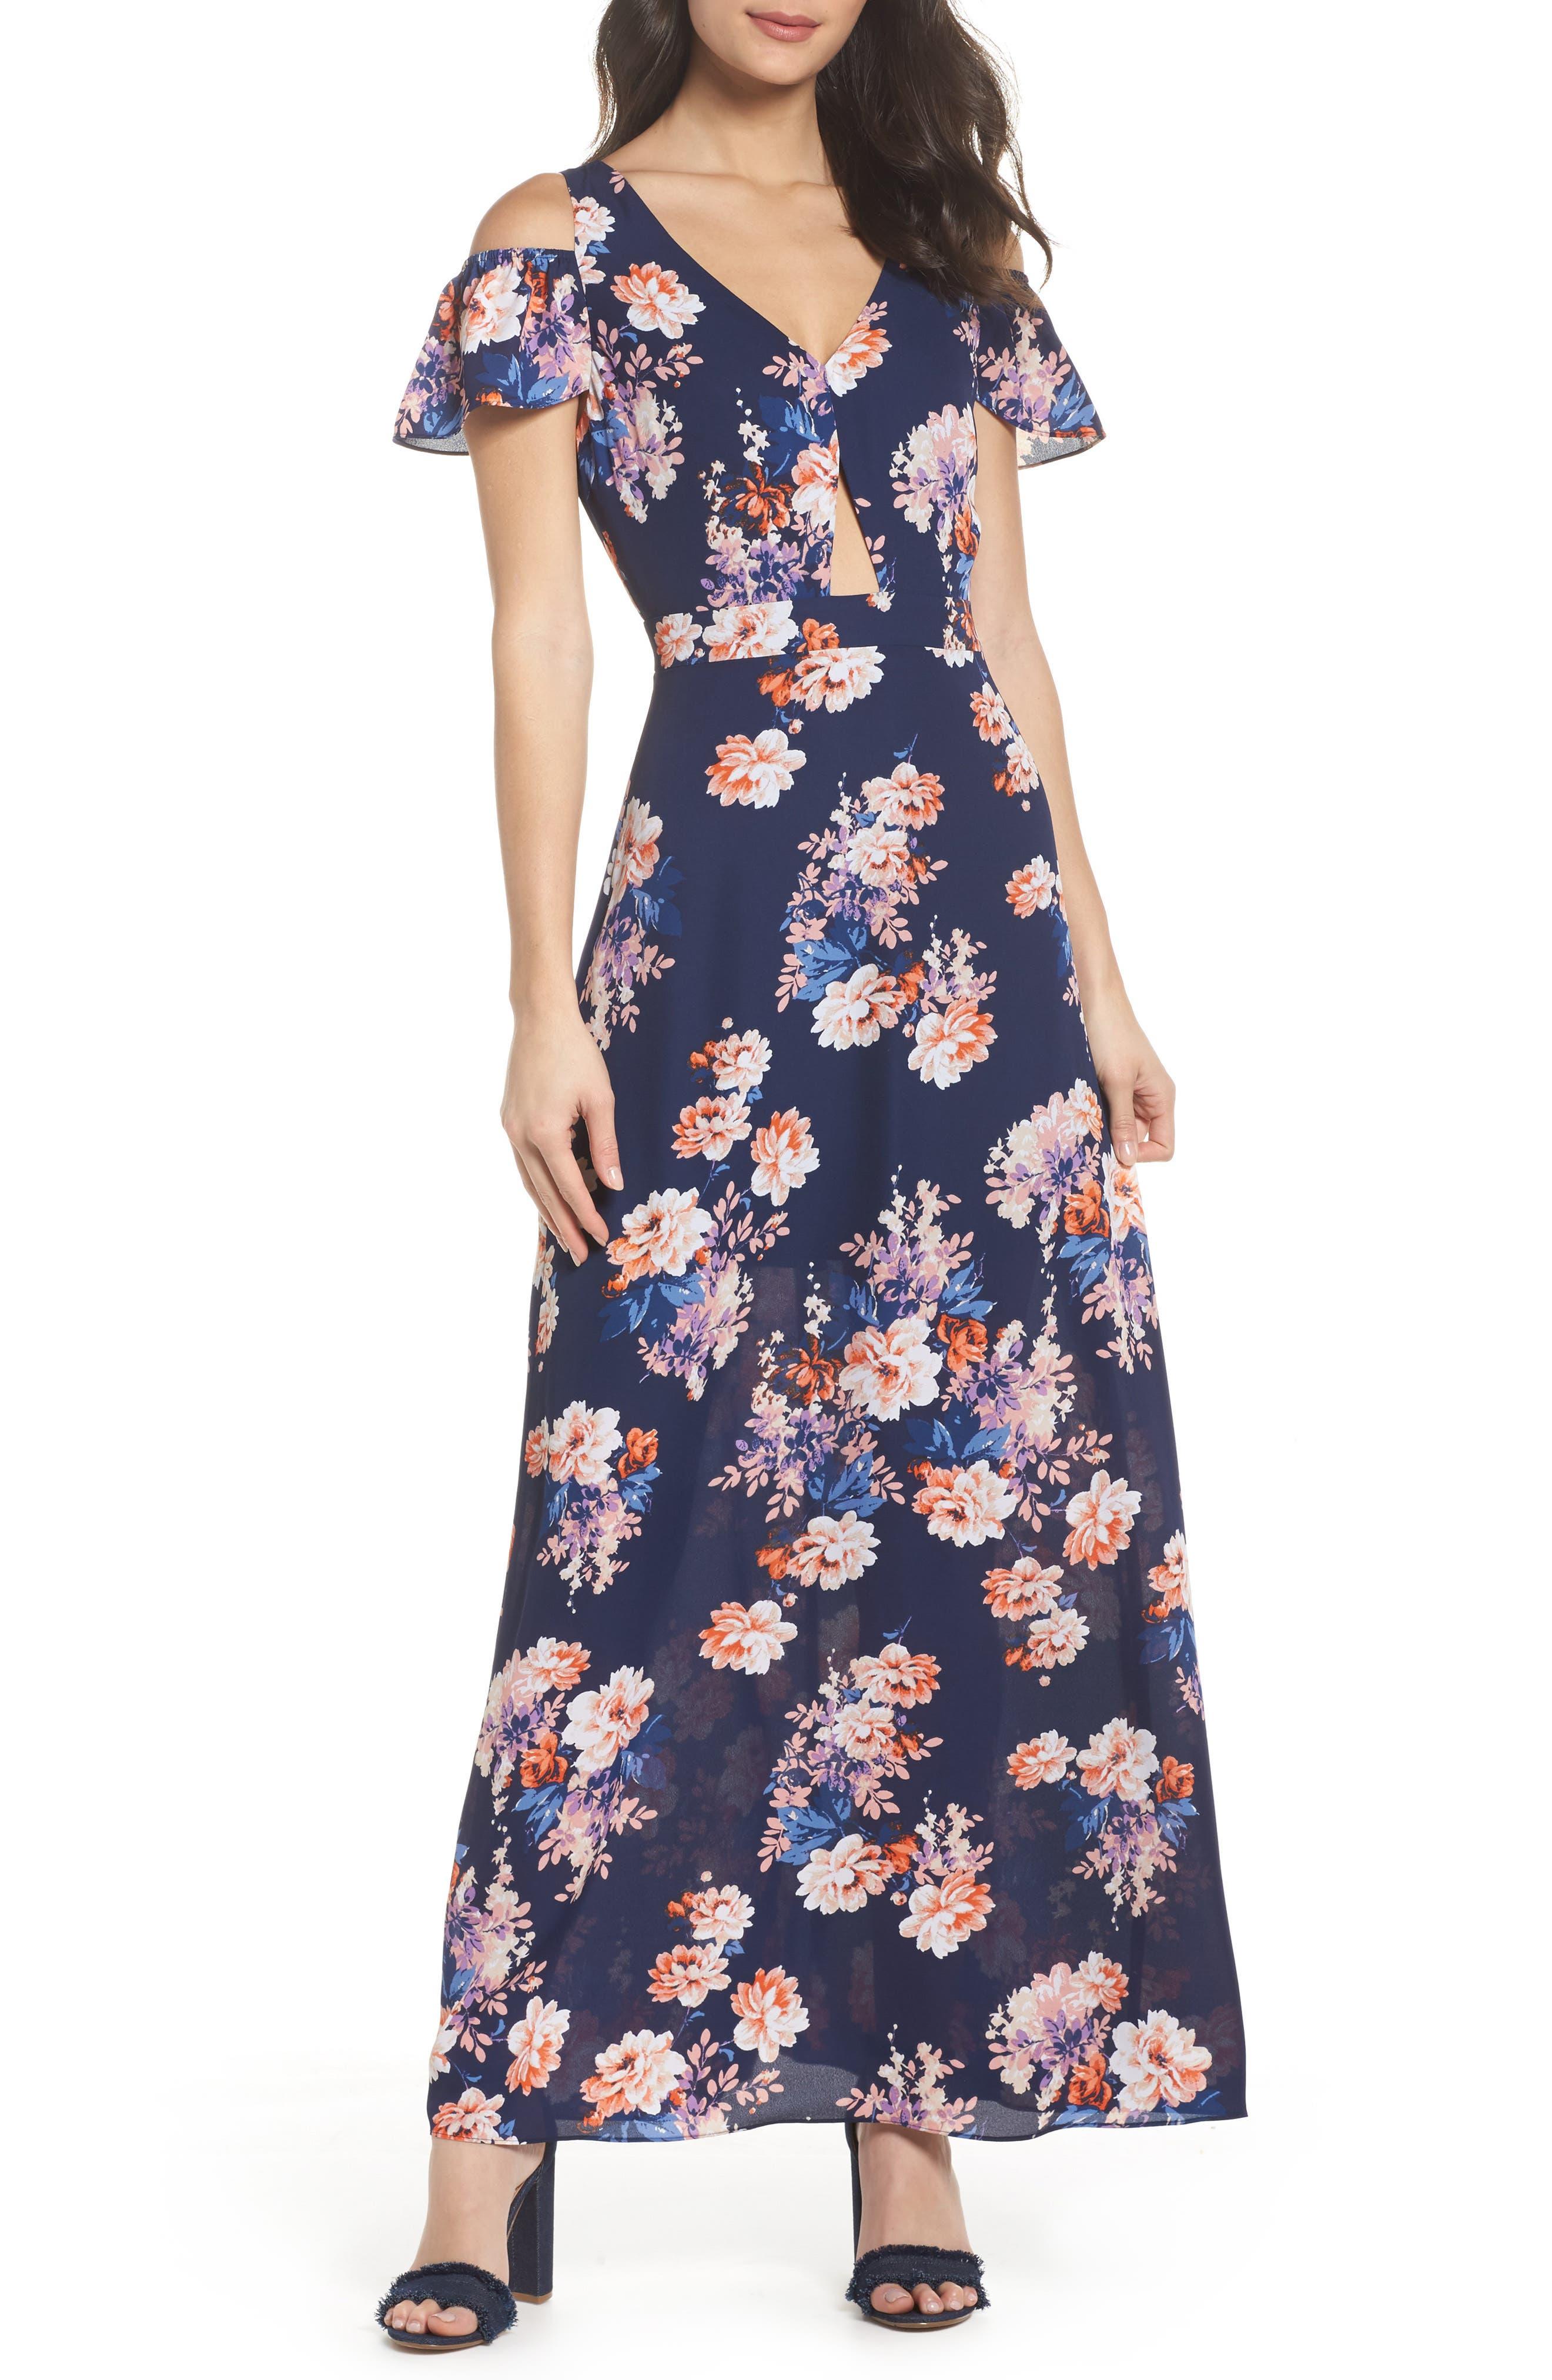 Chasing Butterflies Maxi Dress,                         Main,                         color,